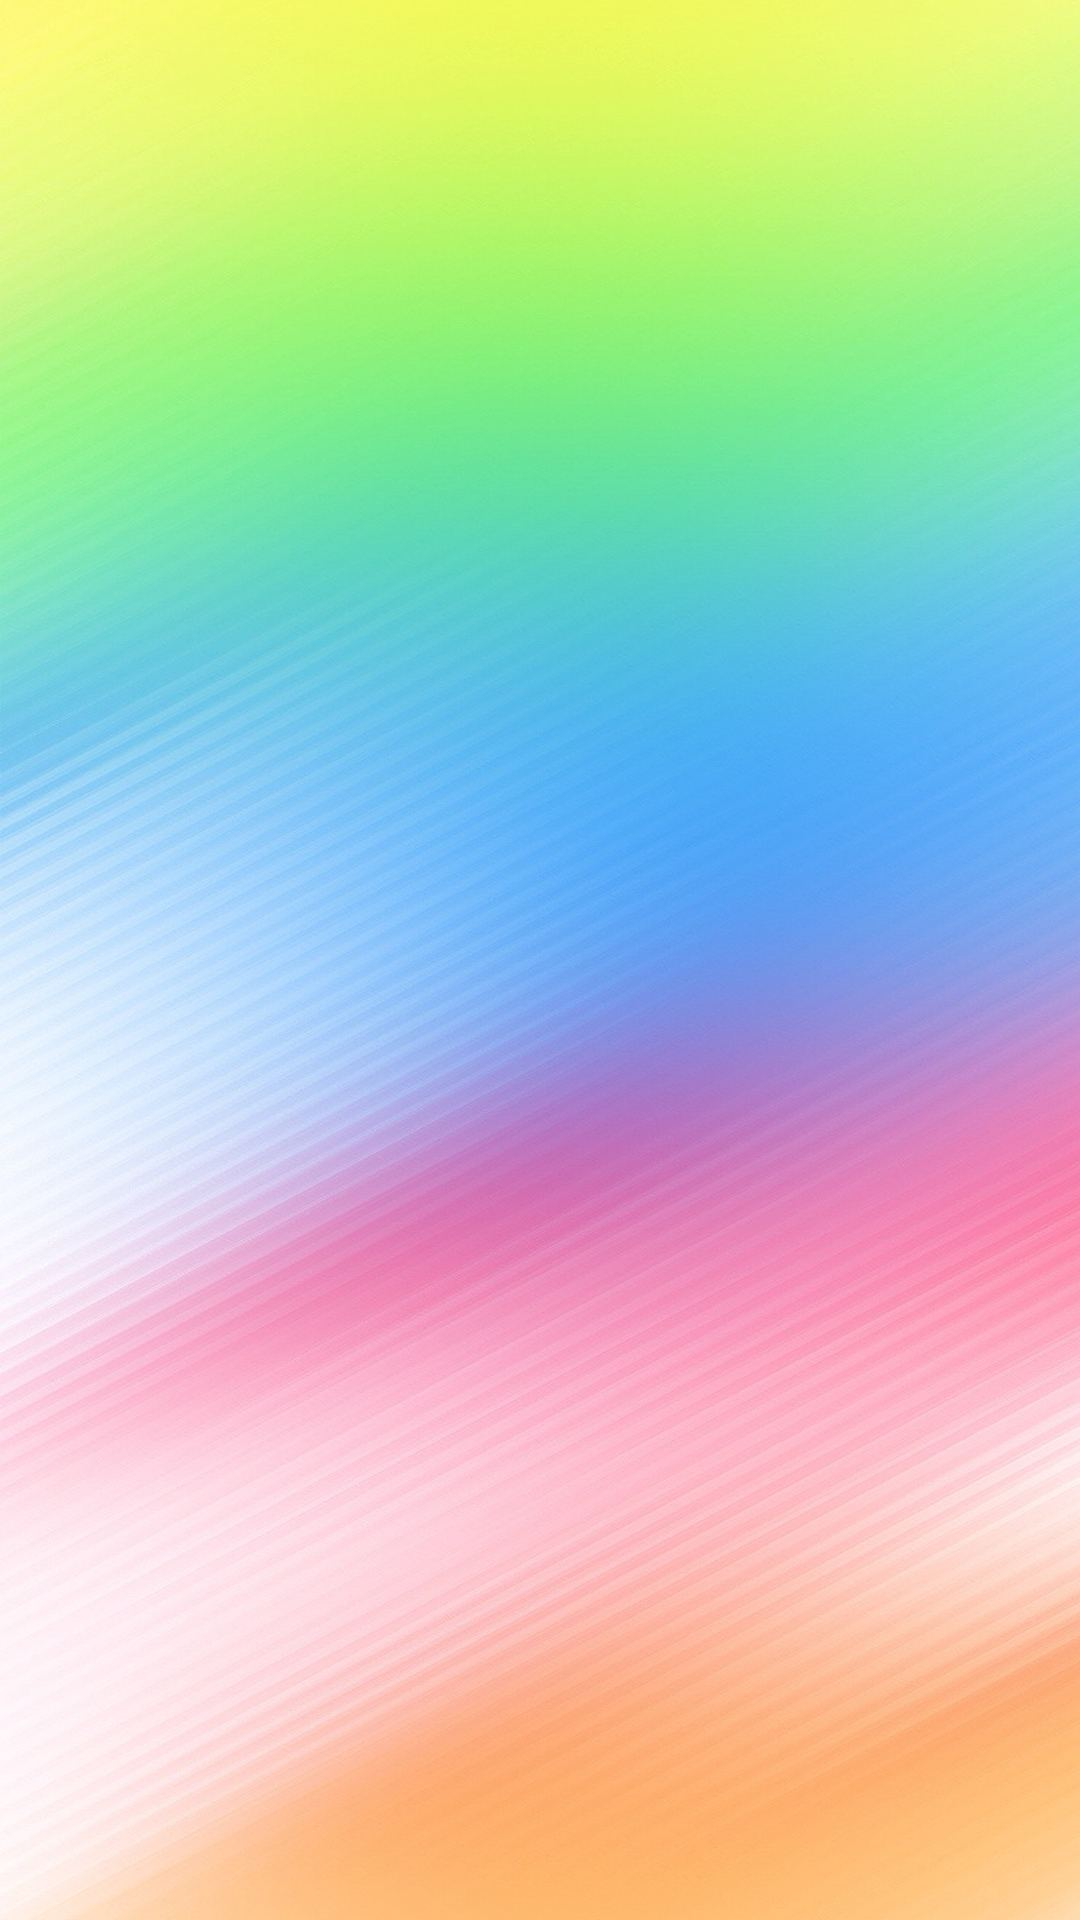 Colorful iOS 8 Stock iPhone 6 Plus HD Wallpaper